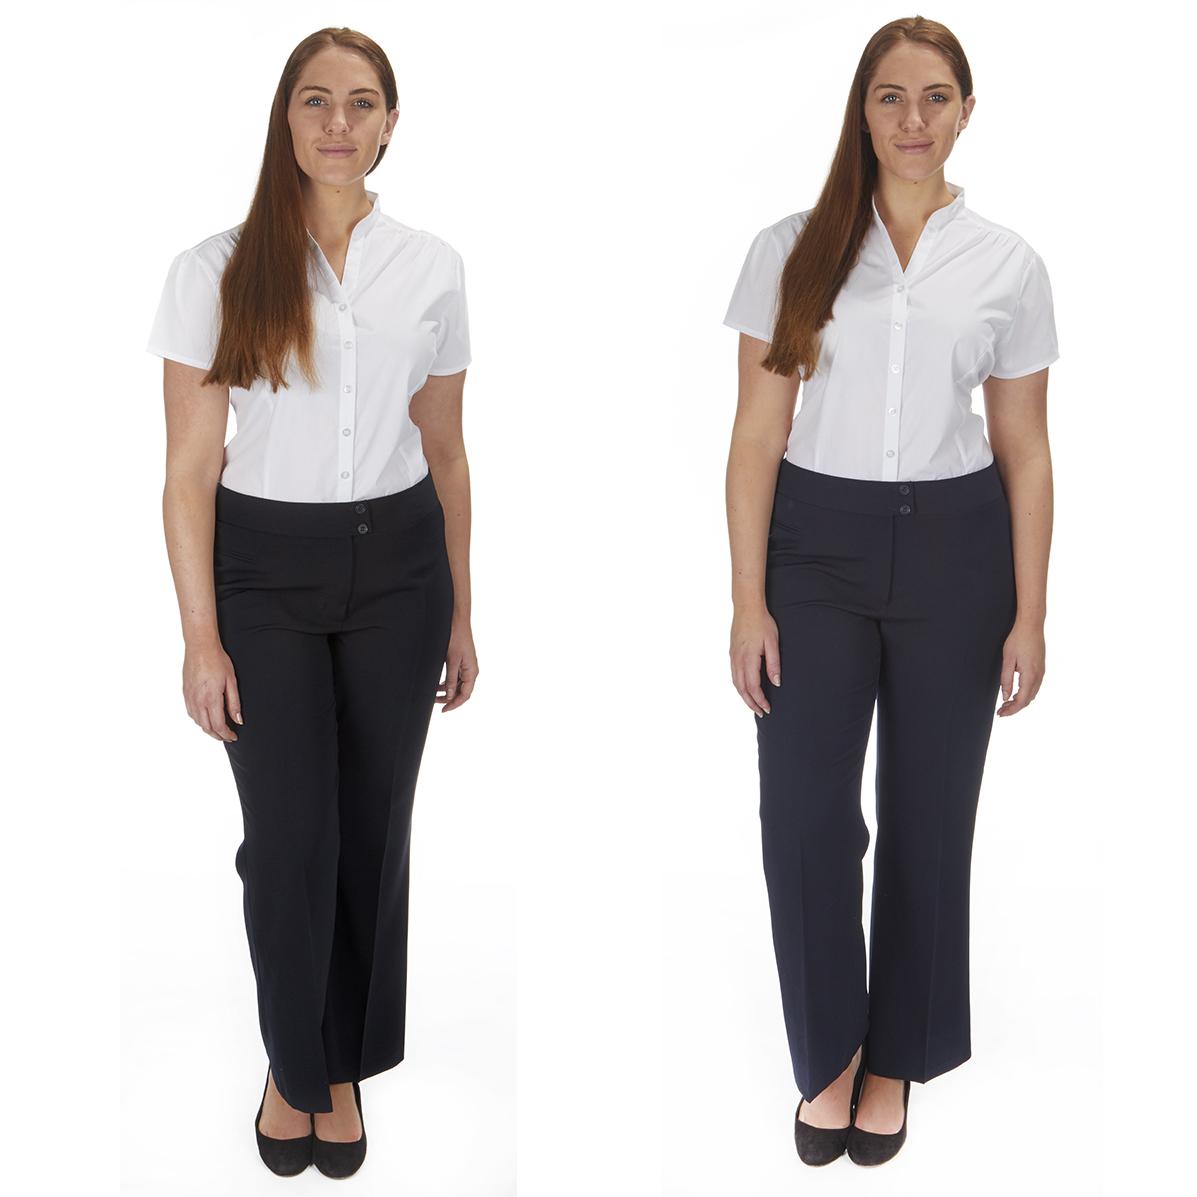 New Ladies Womens Office School Hipster Trousers Navy Grey Black Pants UK 6-18